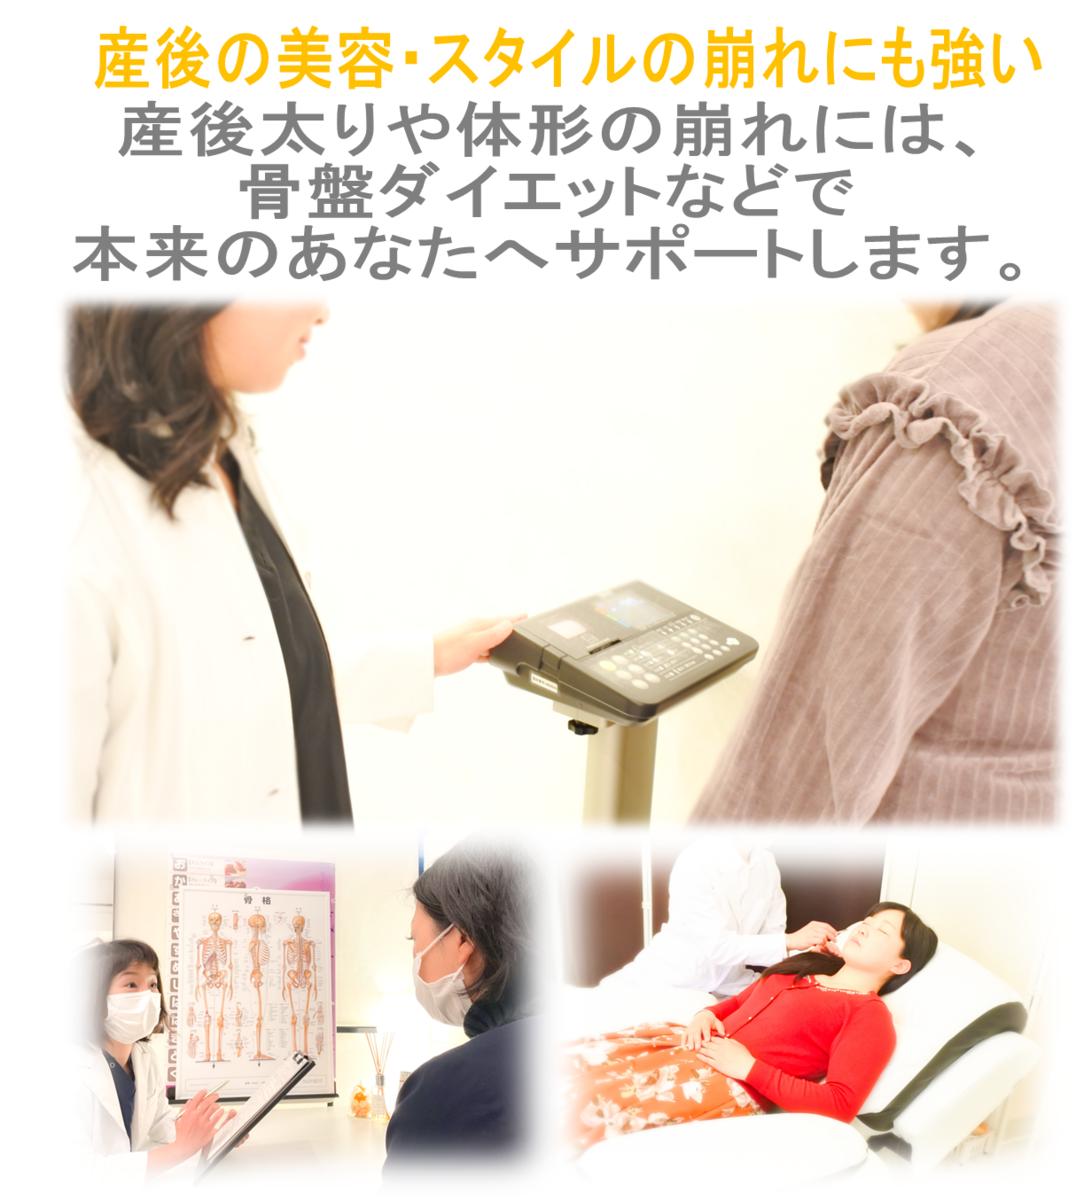 f:id:takatsukiseitai:20201231113849p:plain